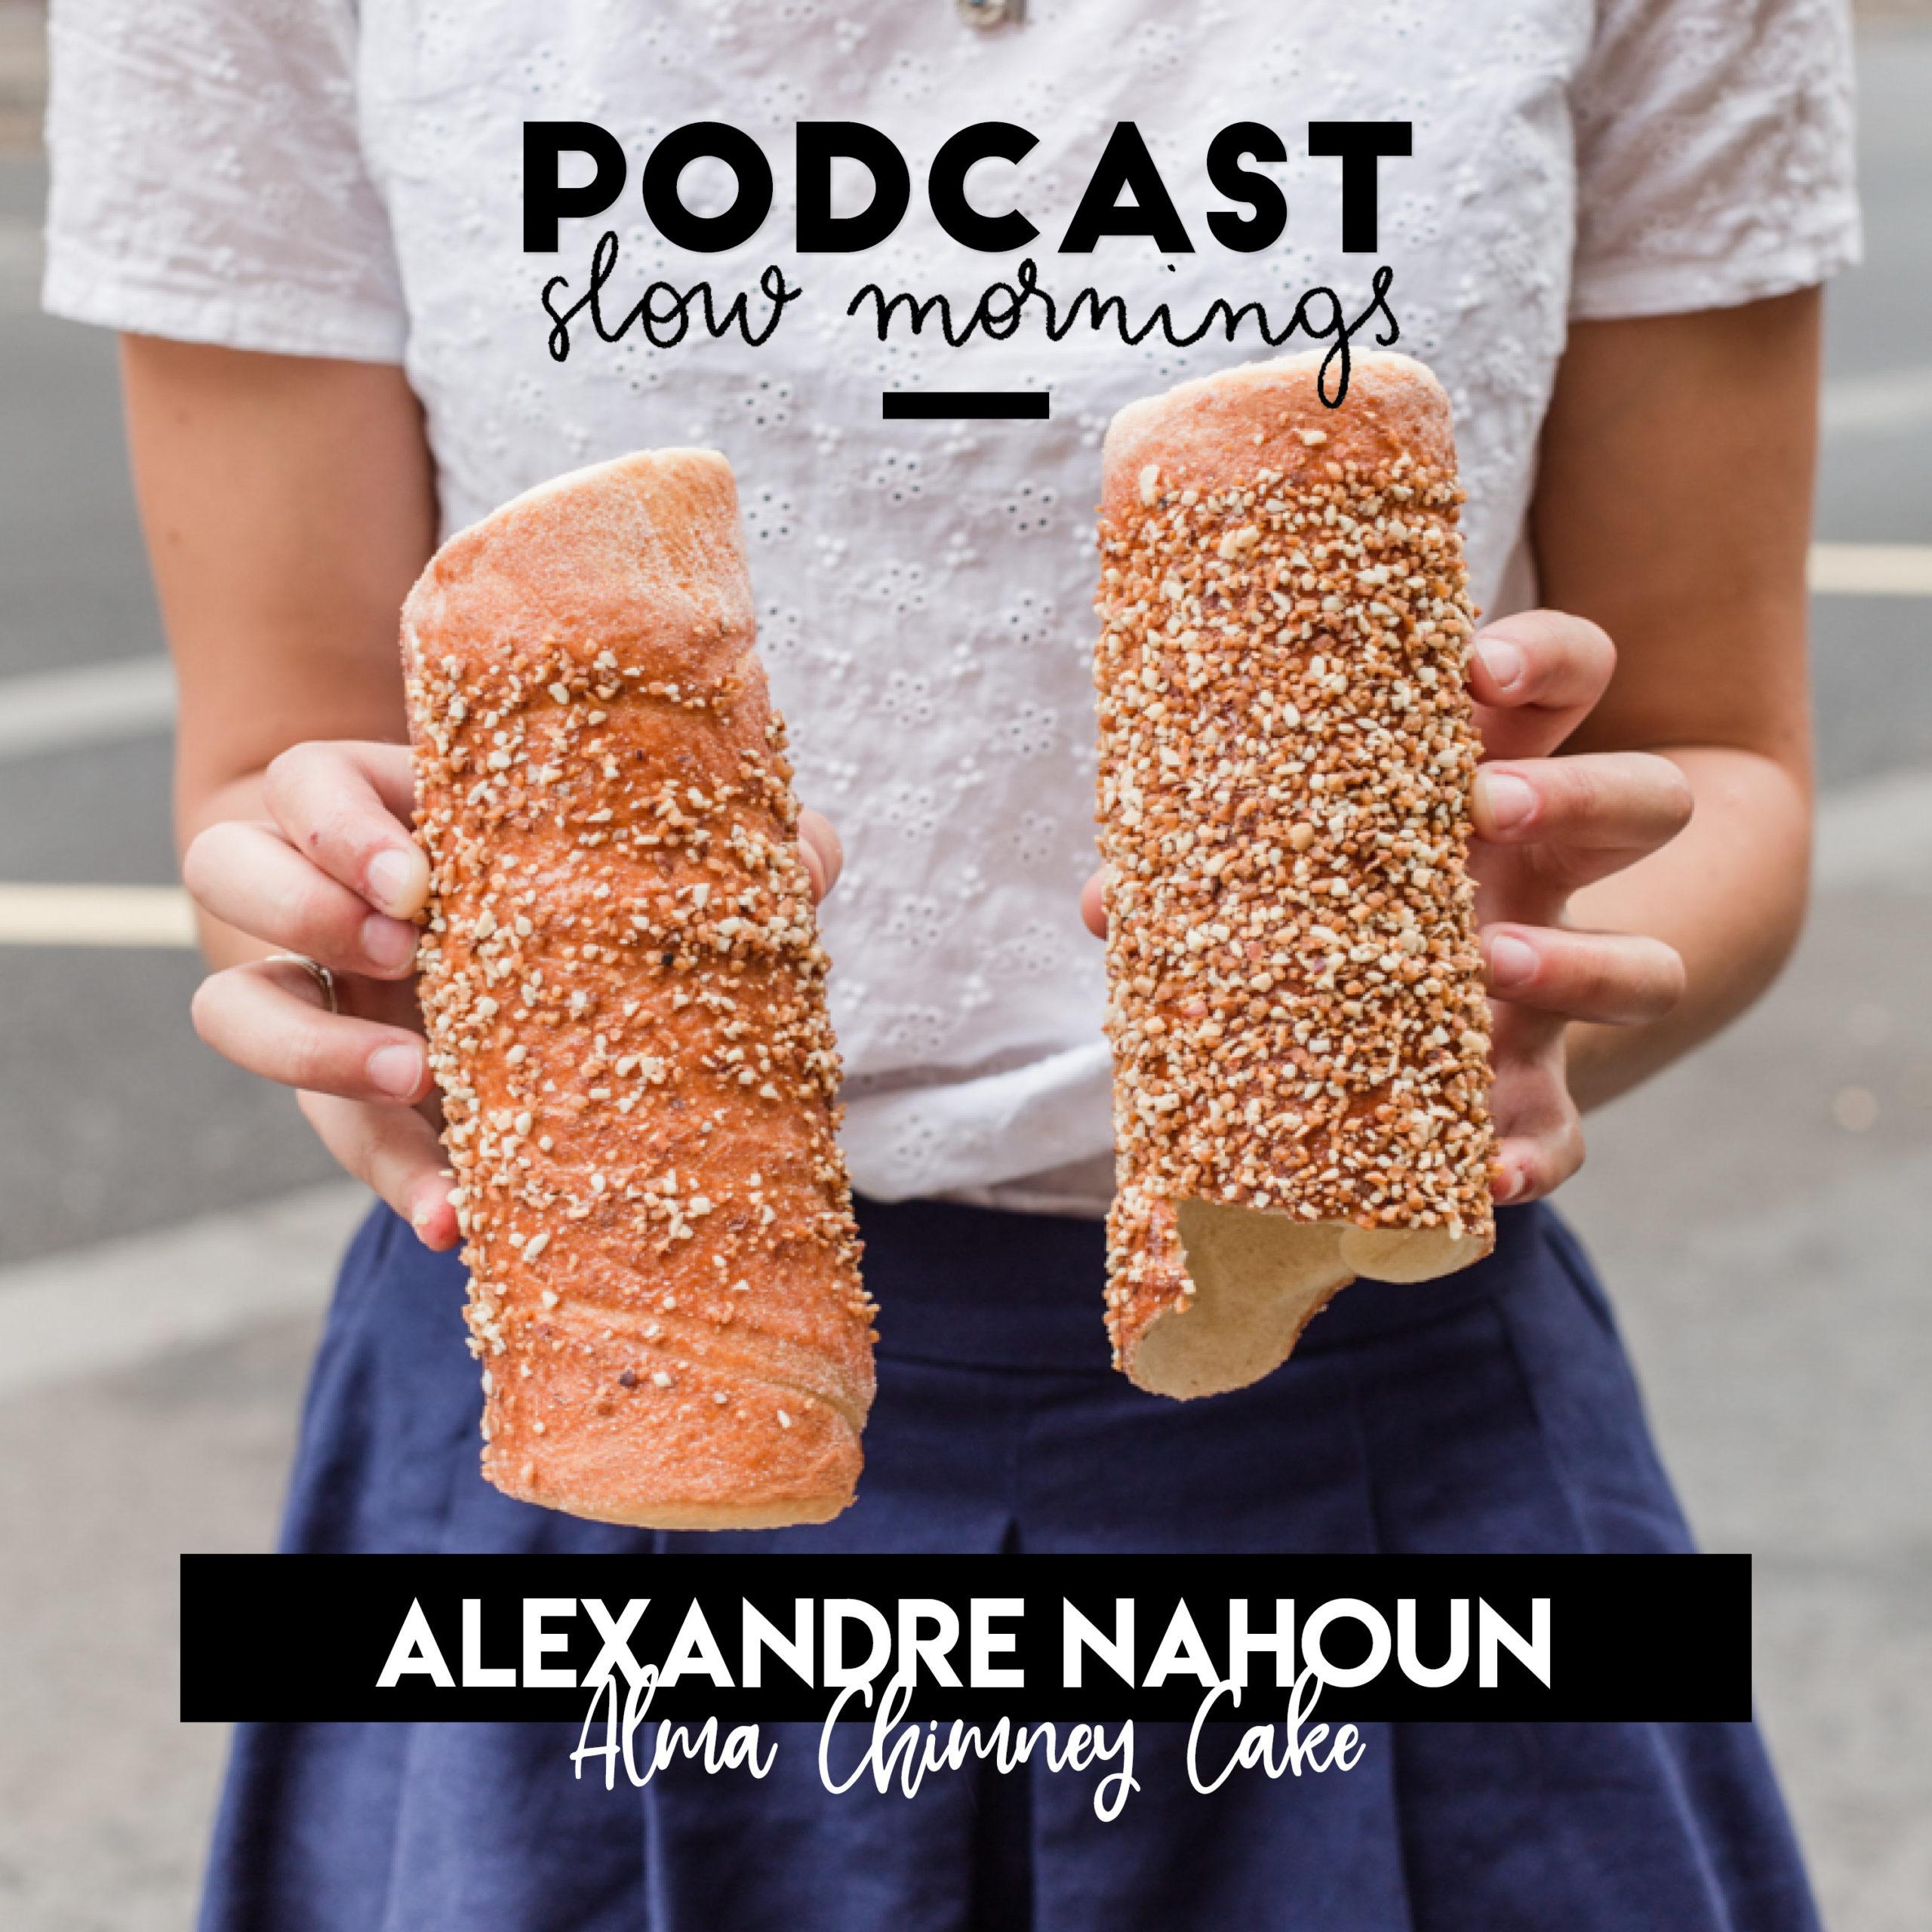 Podcast Entrepreneurs food alma chimney cake